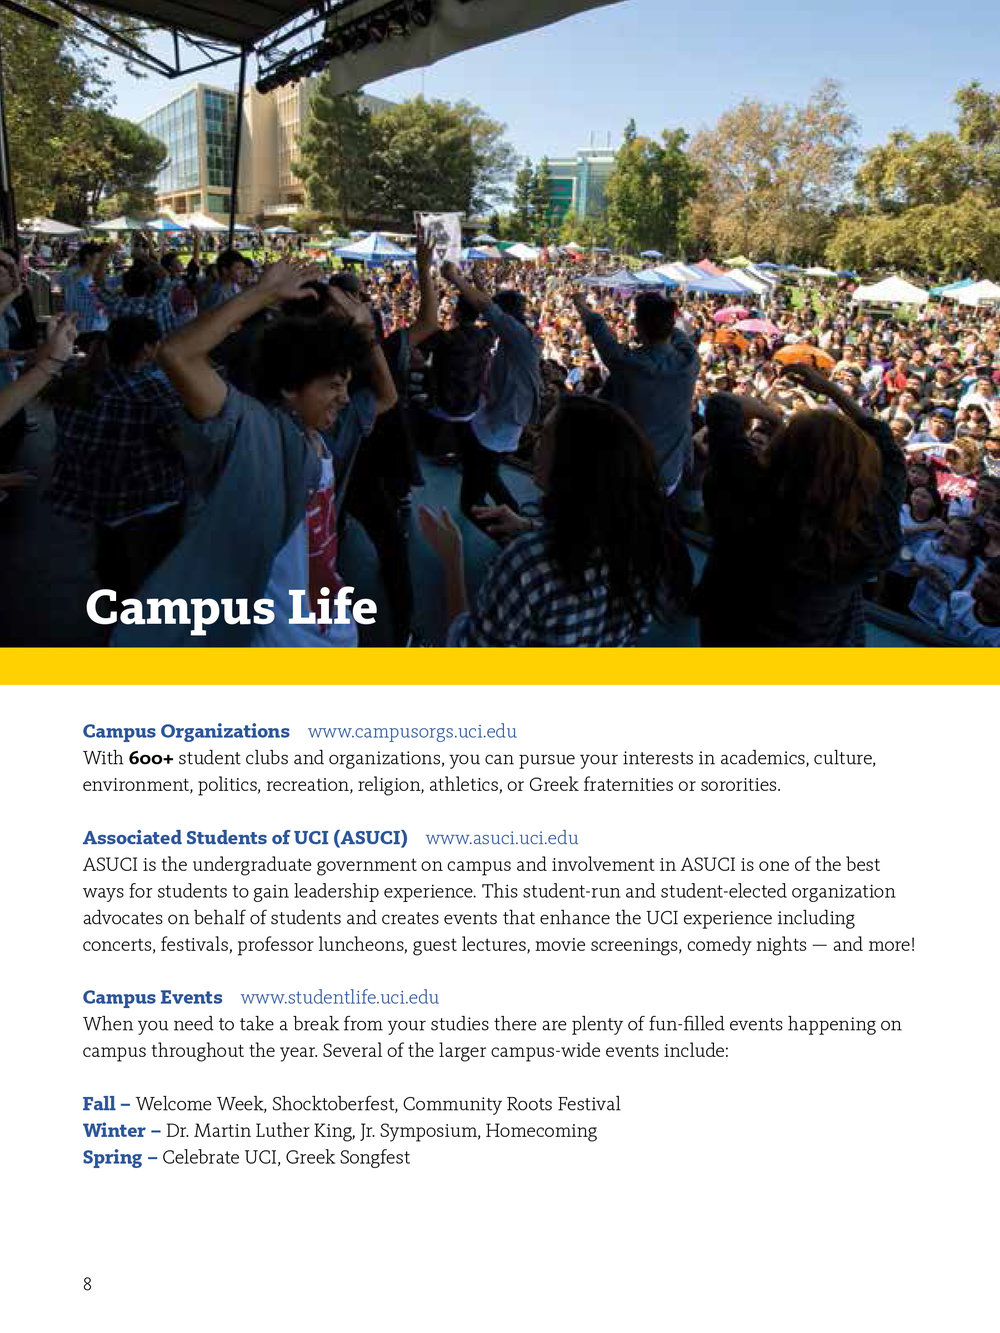 2015-viewbook-campus.jpg